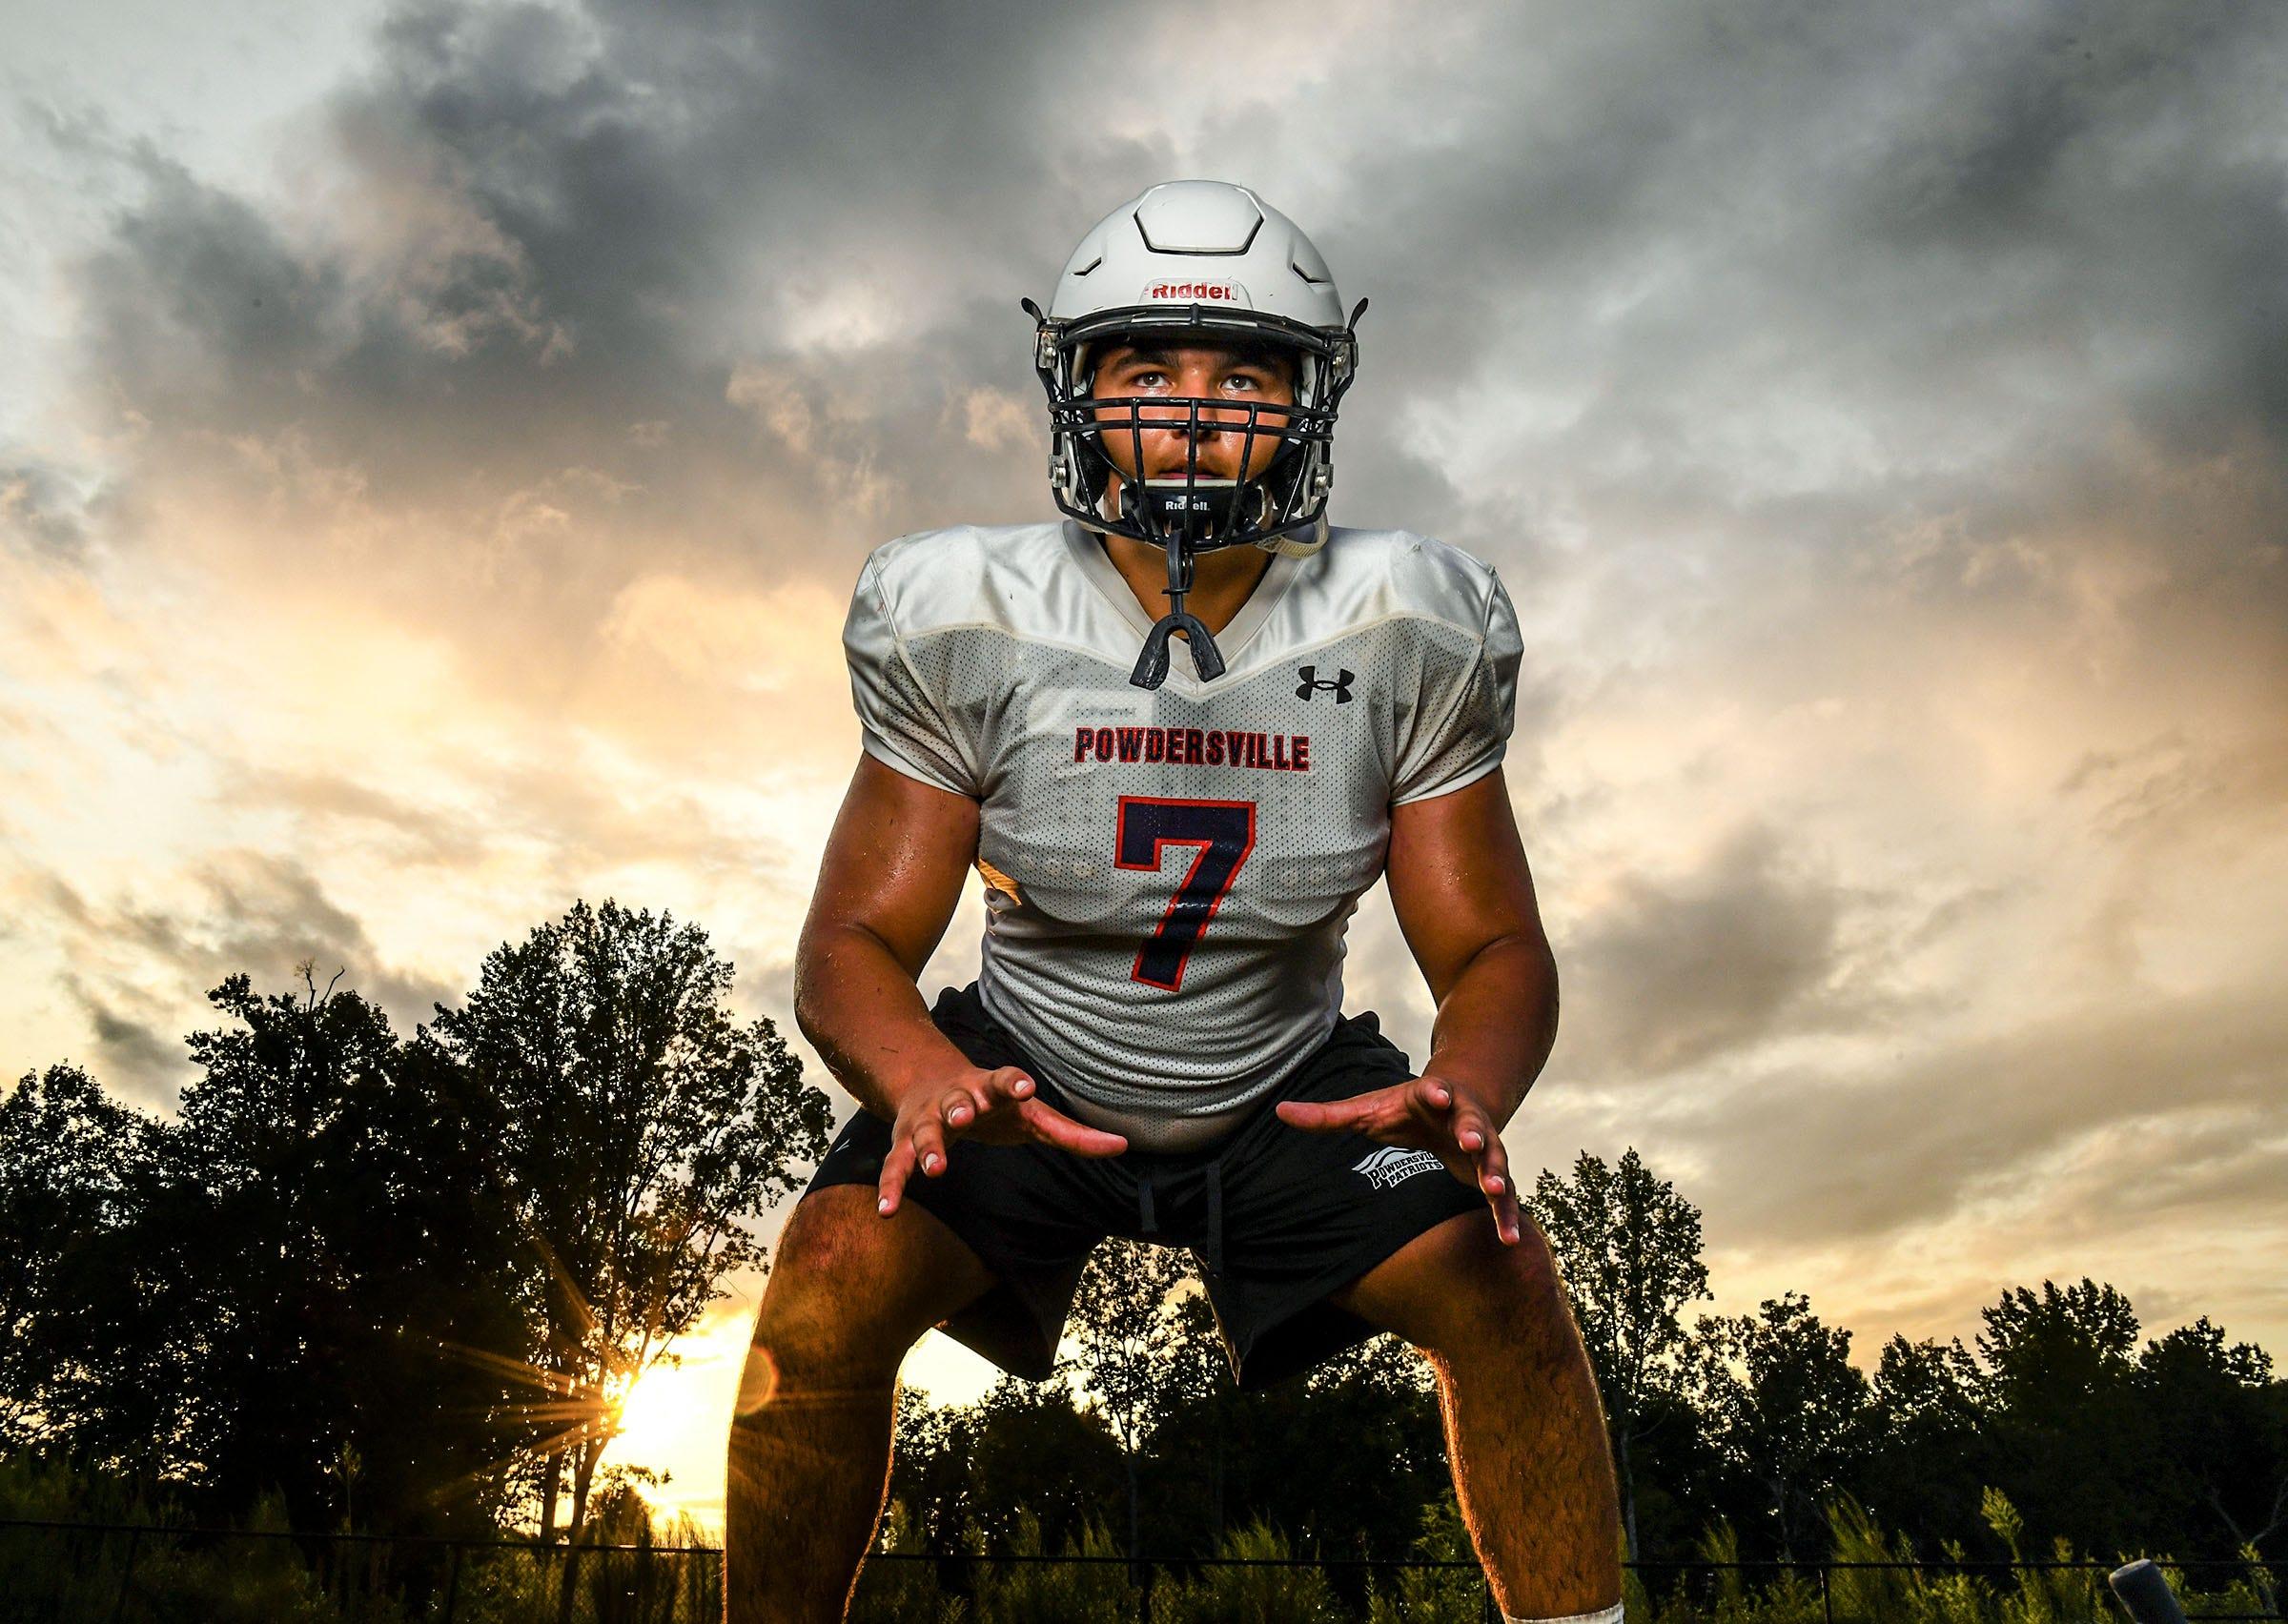 Powdersville High School senior linebacker Will Goforth in Powdersville, S.C. September 2020.